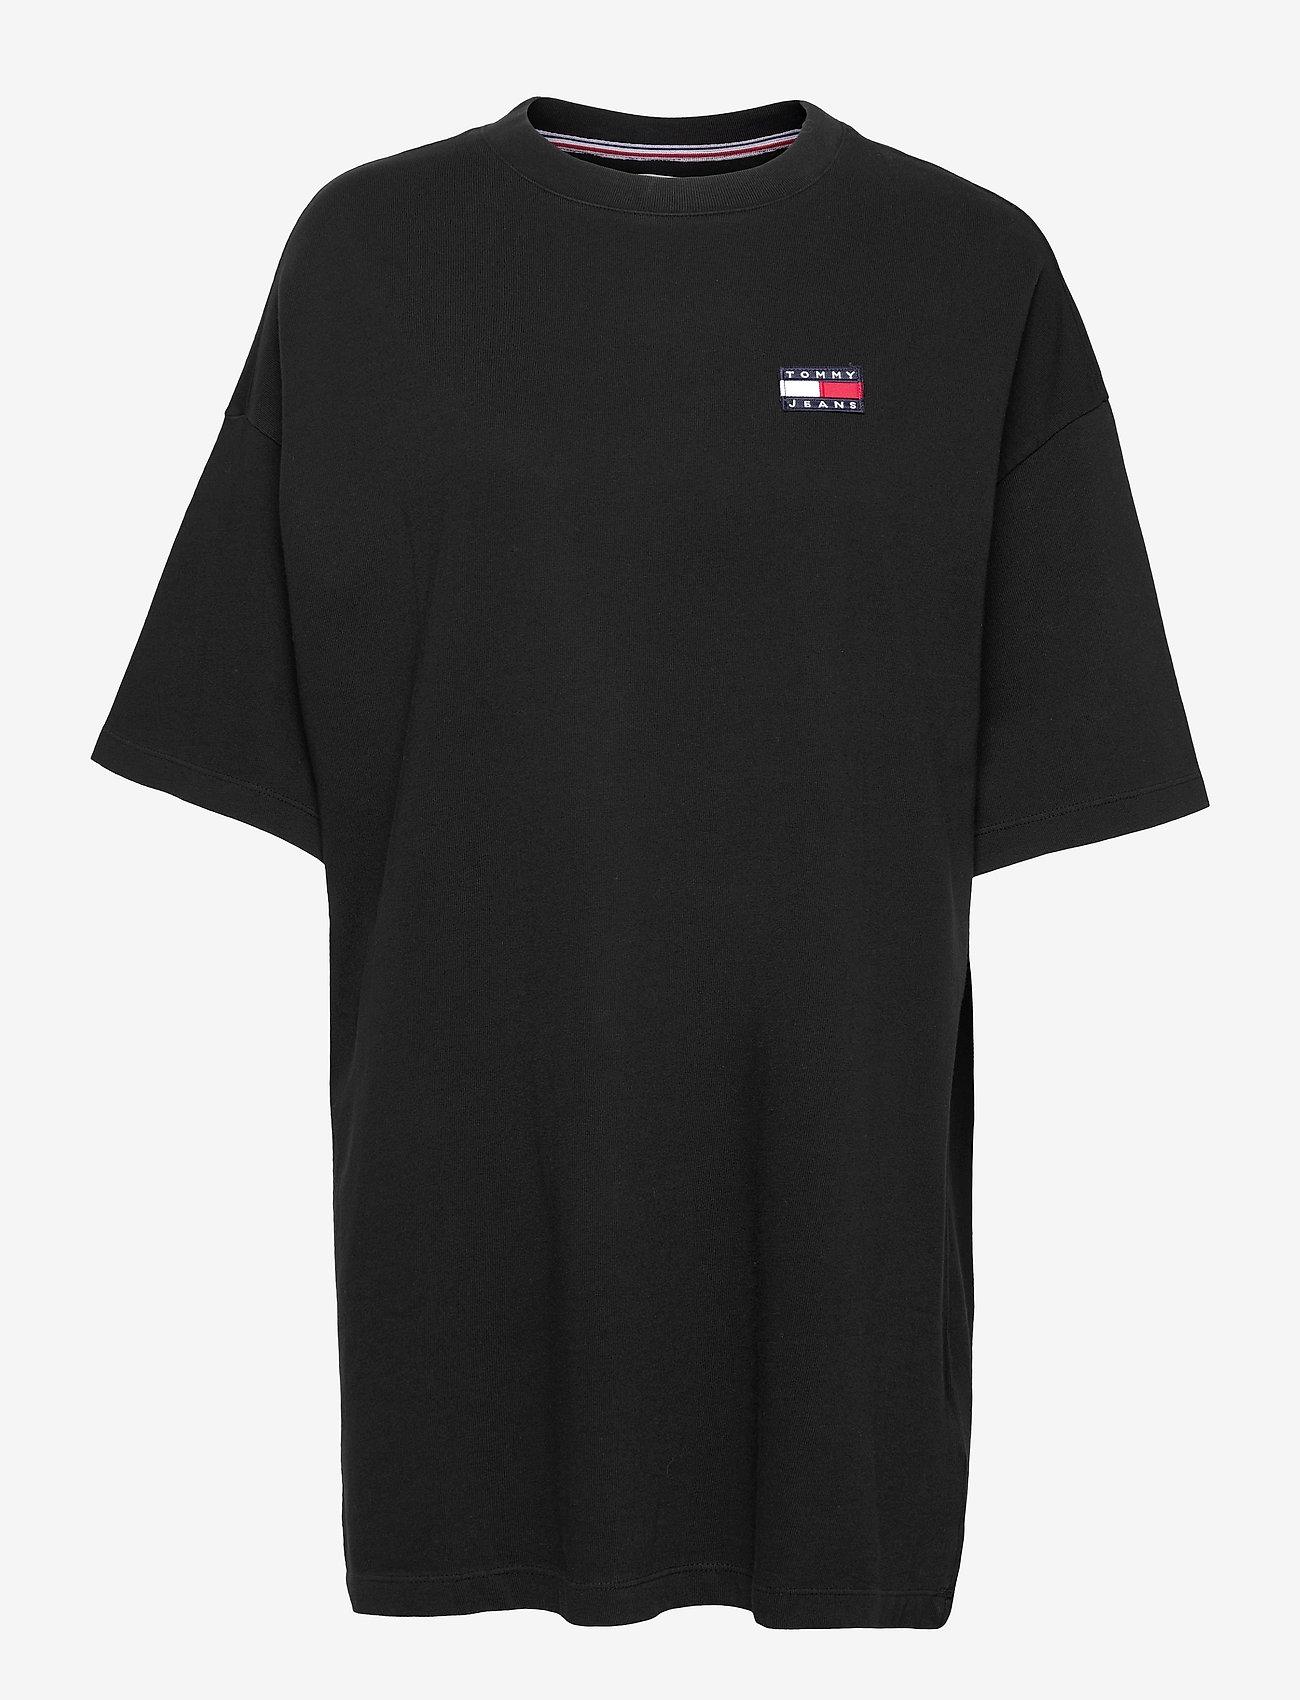 Tommy Jeans - TJW OVERSIZED BADGE TEE DRESS - t-shirts - black - 0